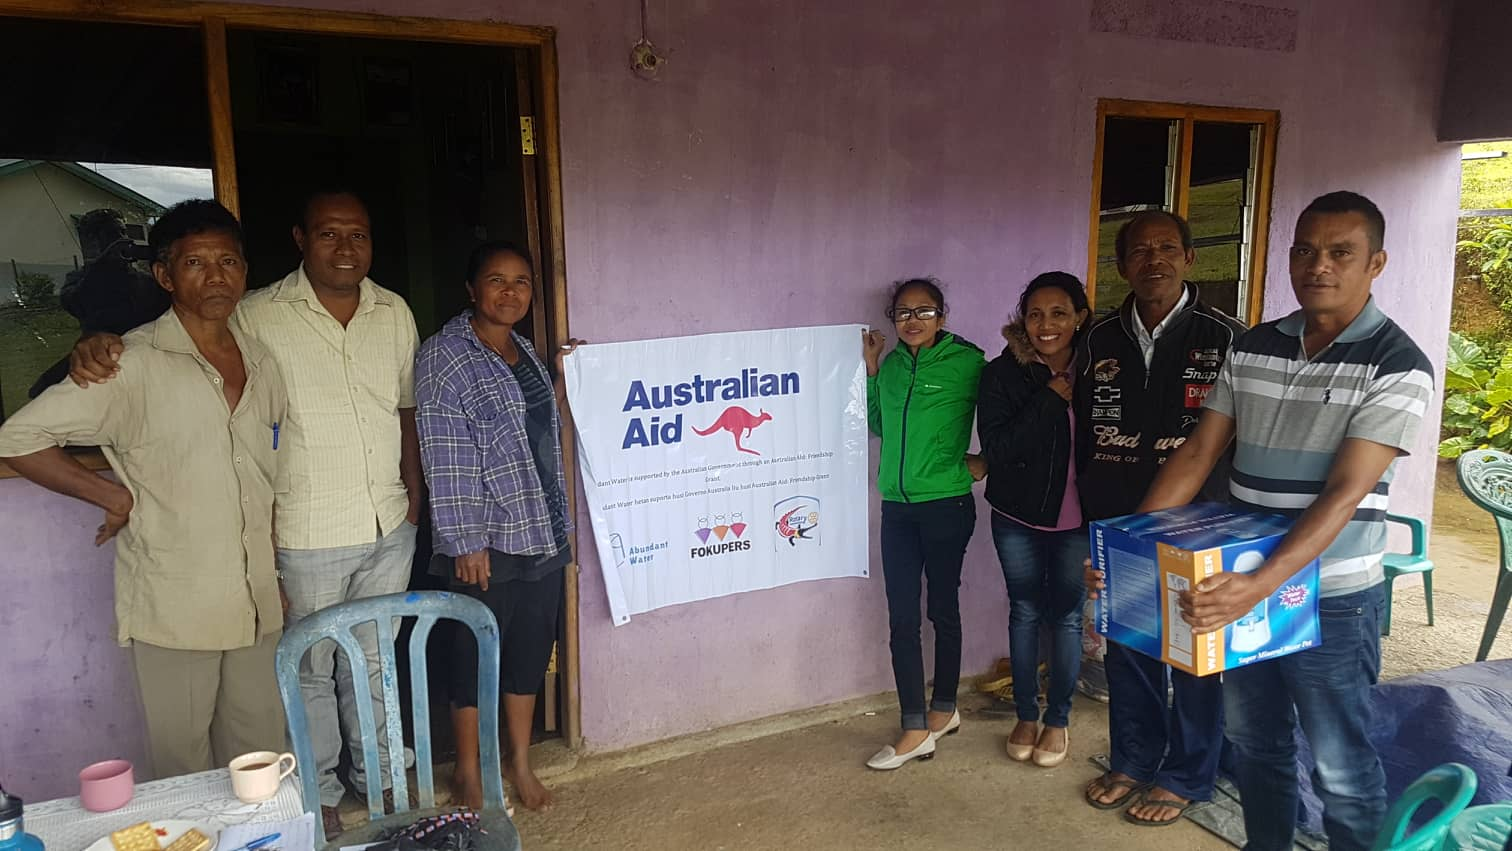 left to right: Manuel (FOKUPERS), Simao (Abundant Water), Rita (Abundant Water vendor), Imaculada (FOKUPERS), Azina (FOKUPERS), Alarico (member of Liquica business group) and Alfonso (Abundant Water vendor).